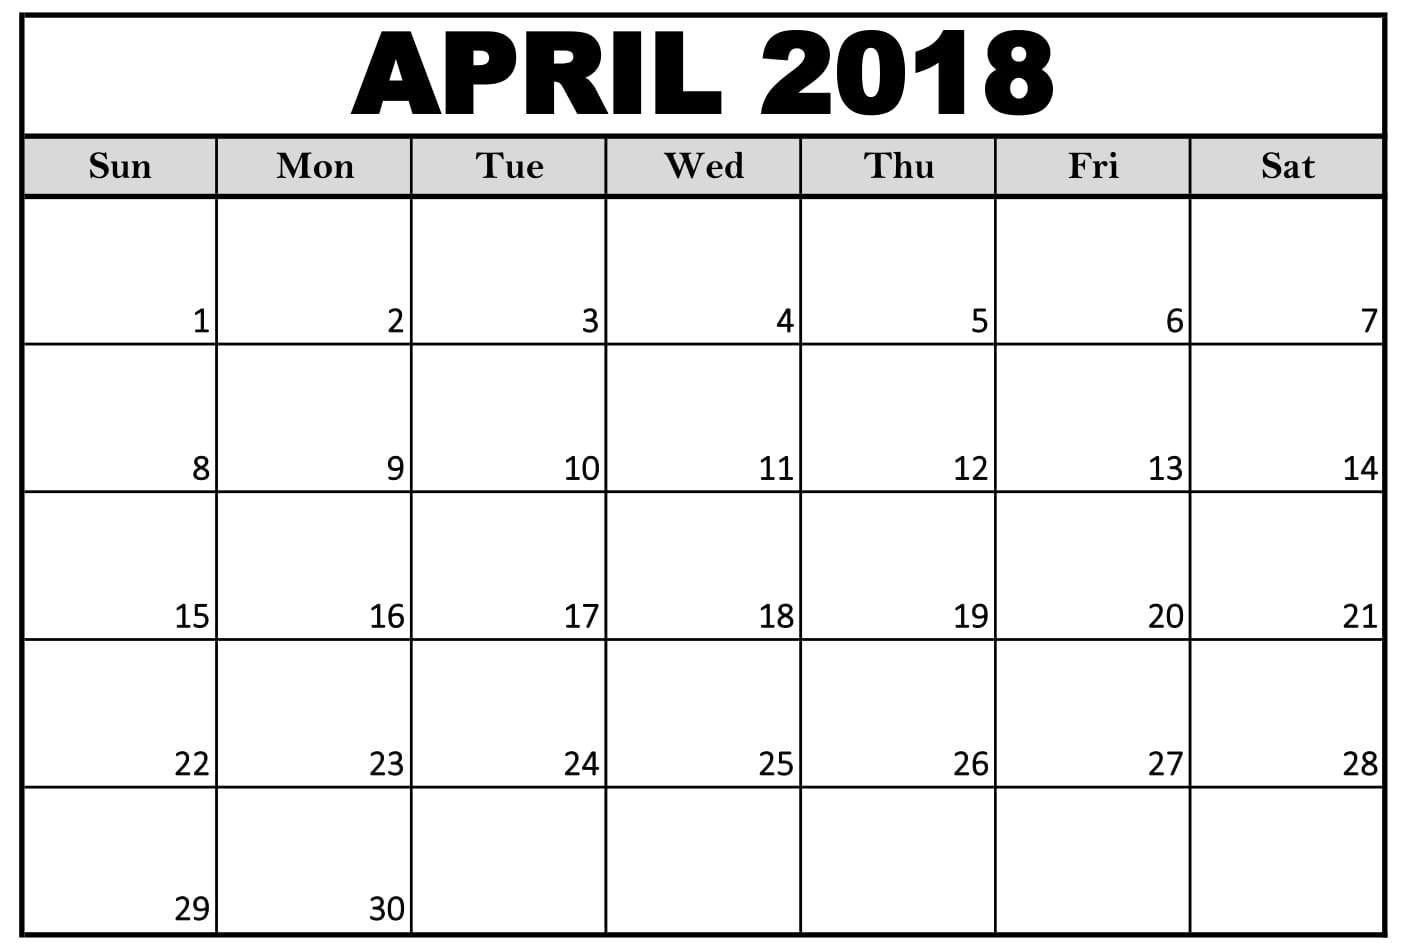 April 2018 Blank calendar